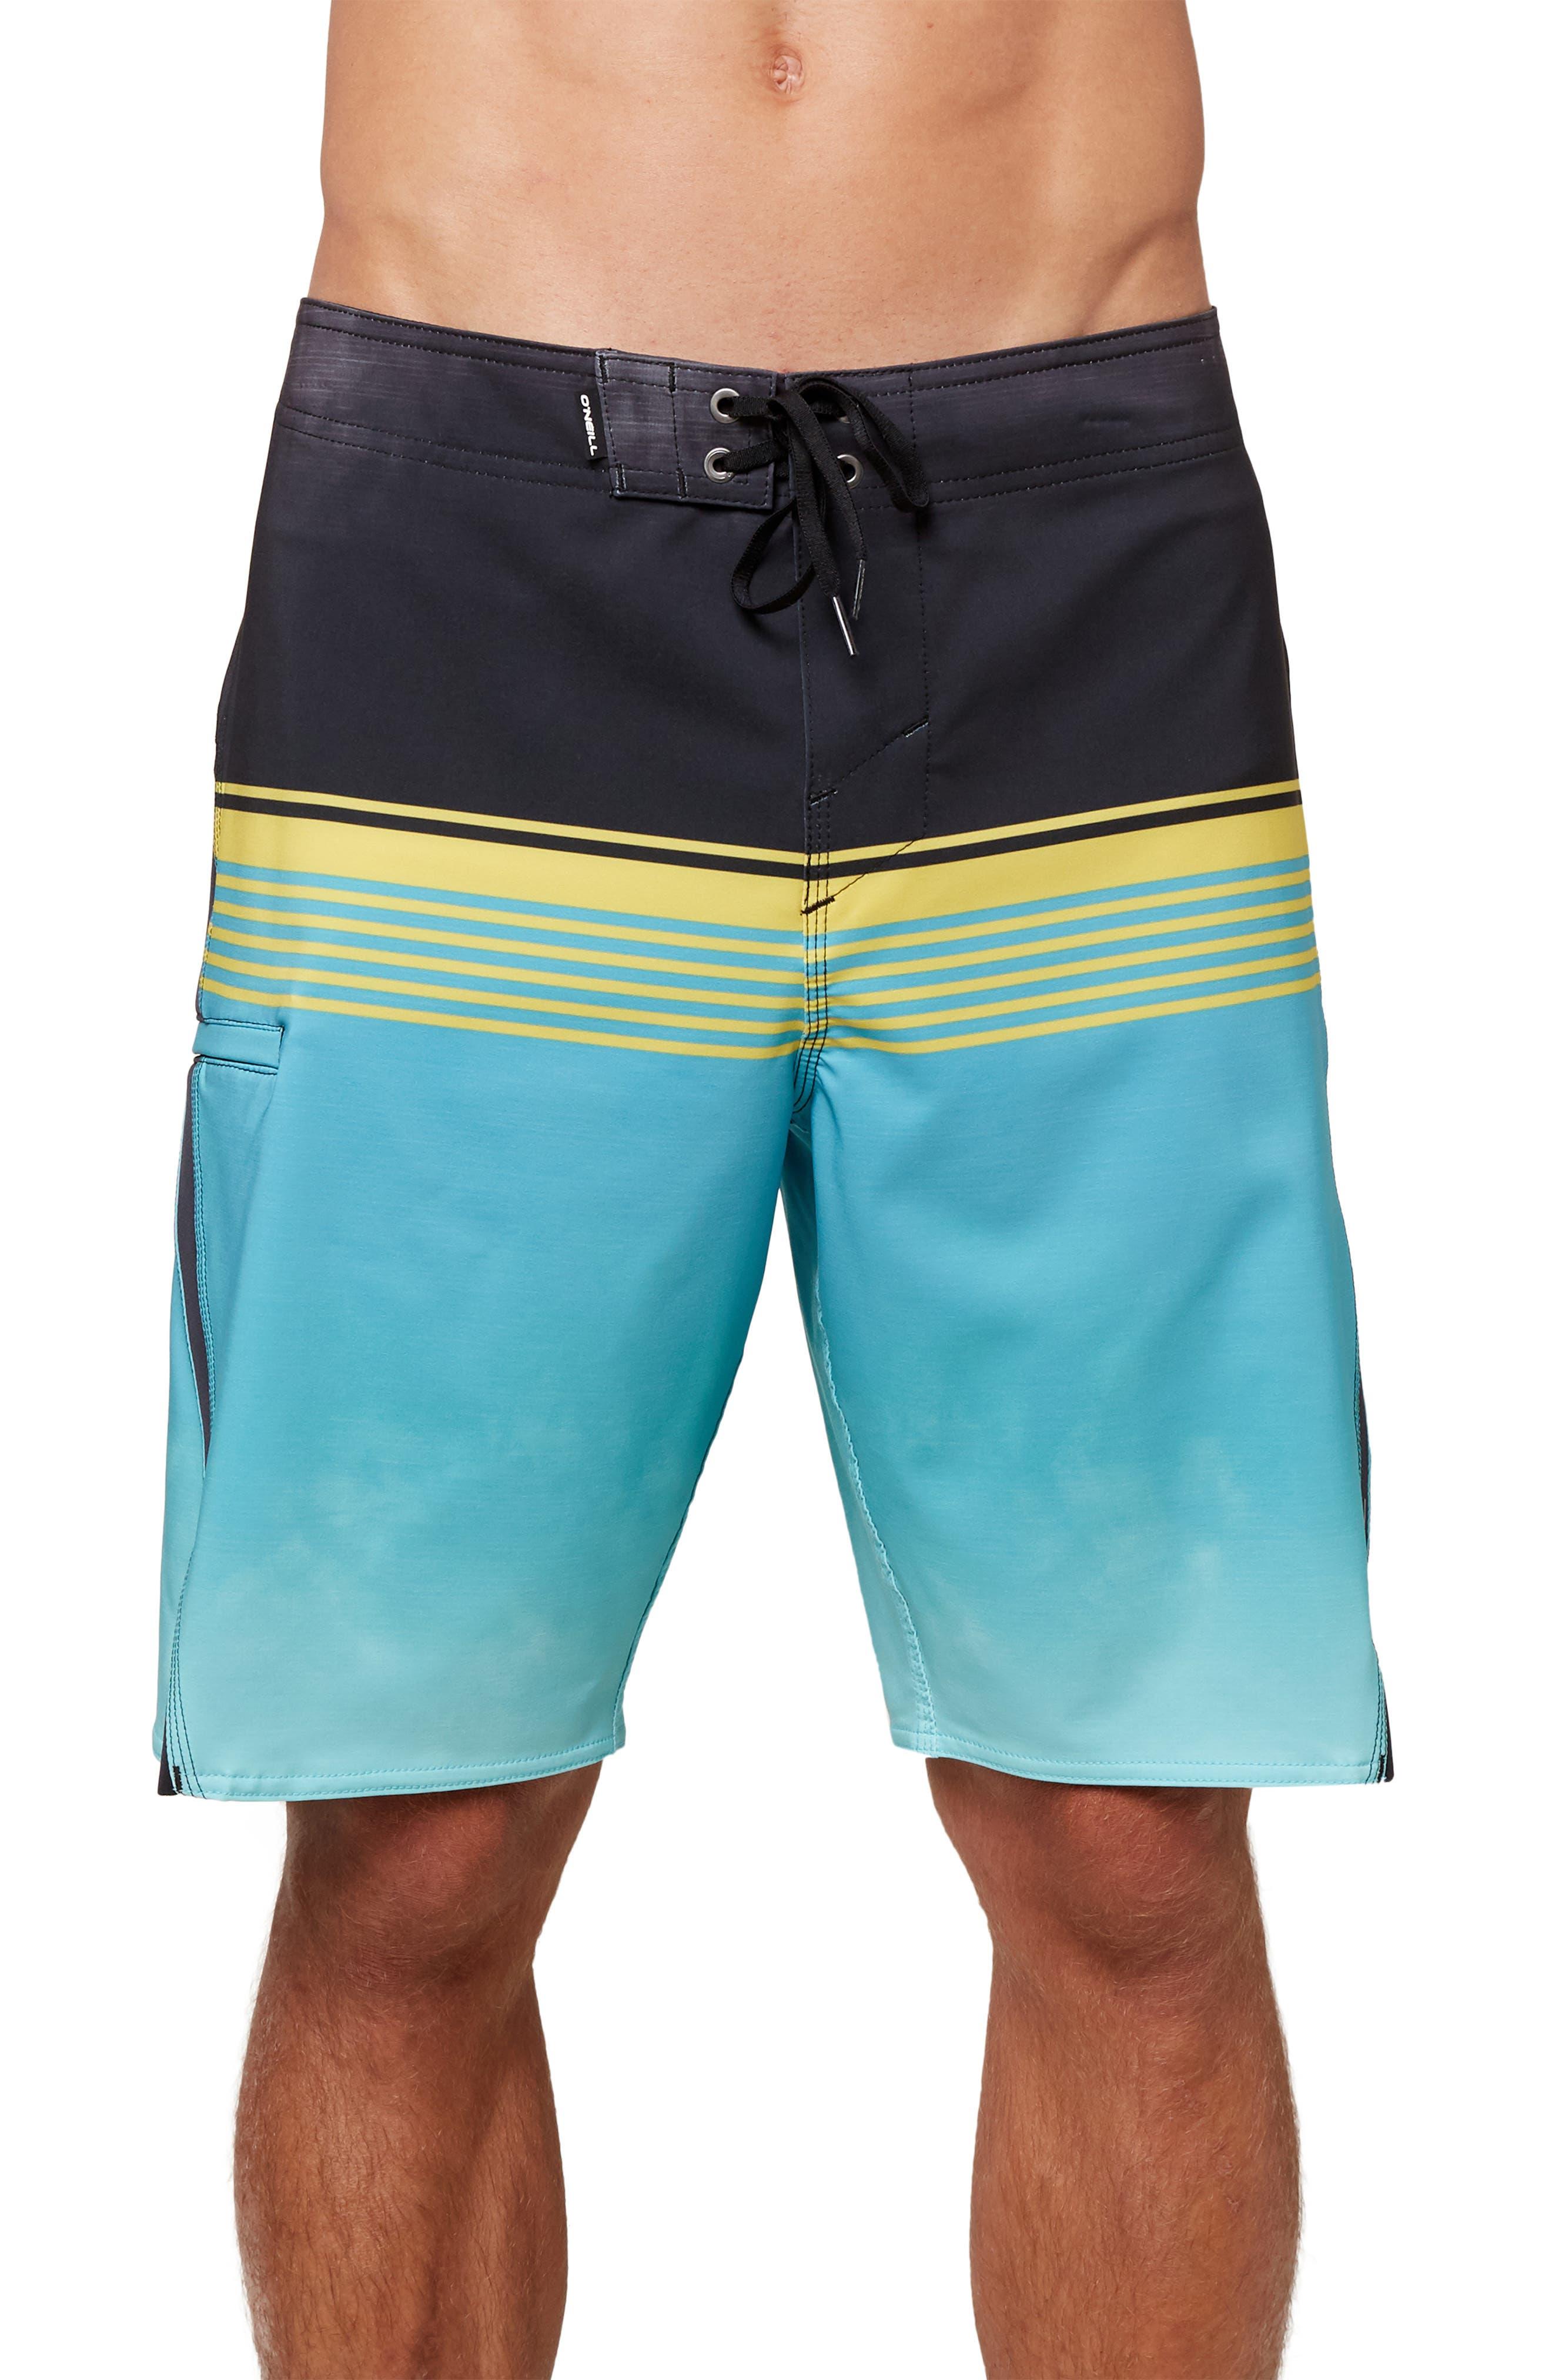 Oneill Papillon Board Shorts Homme Pantalon swimwear beachwear s Noir